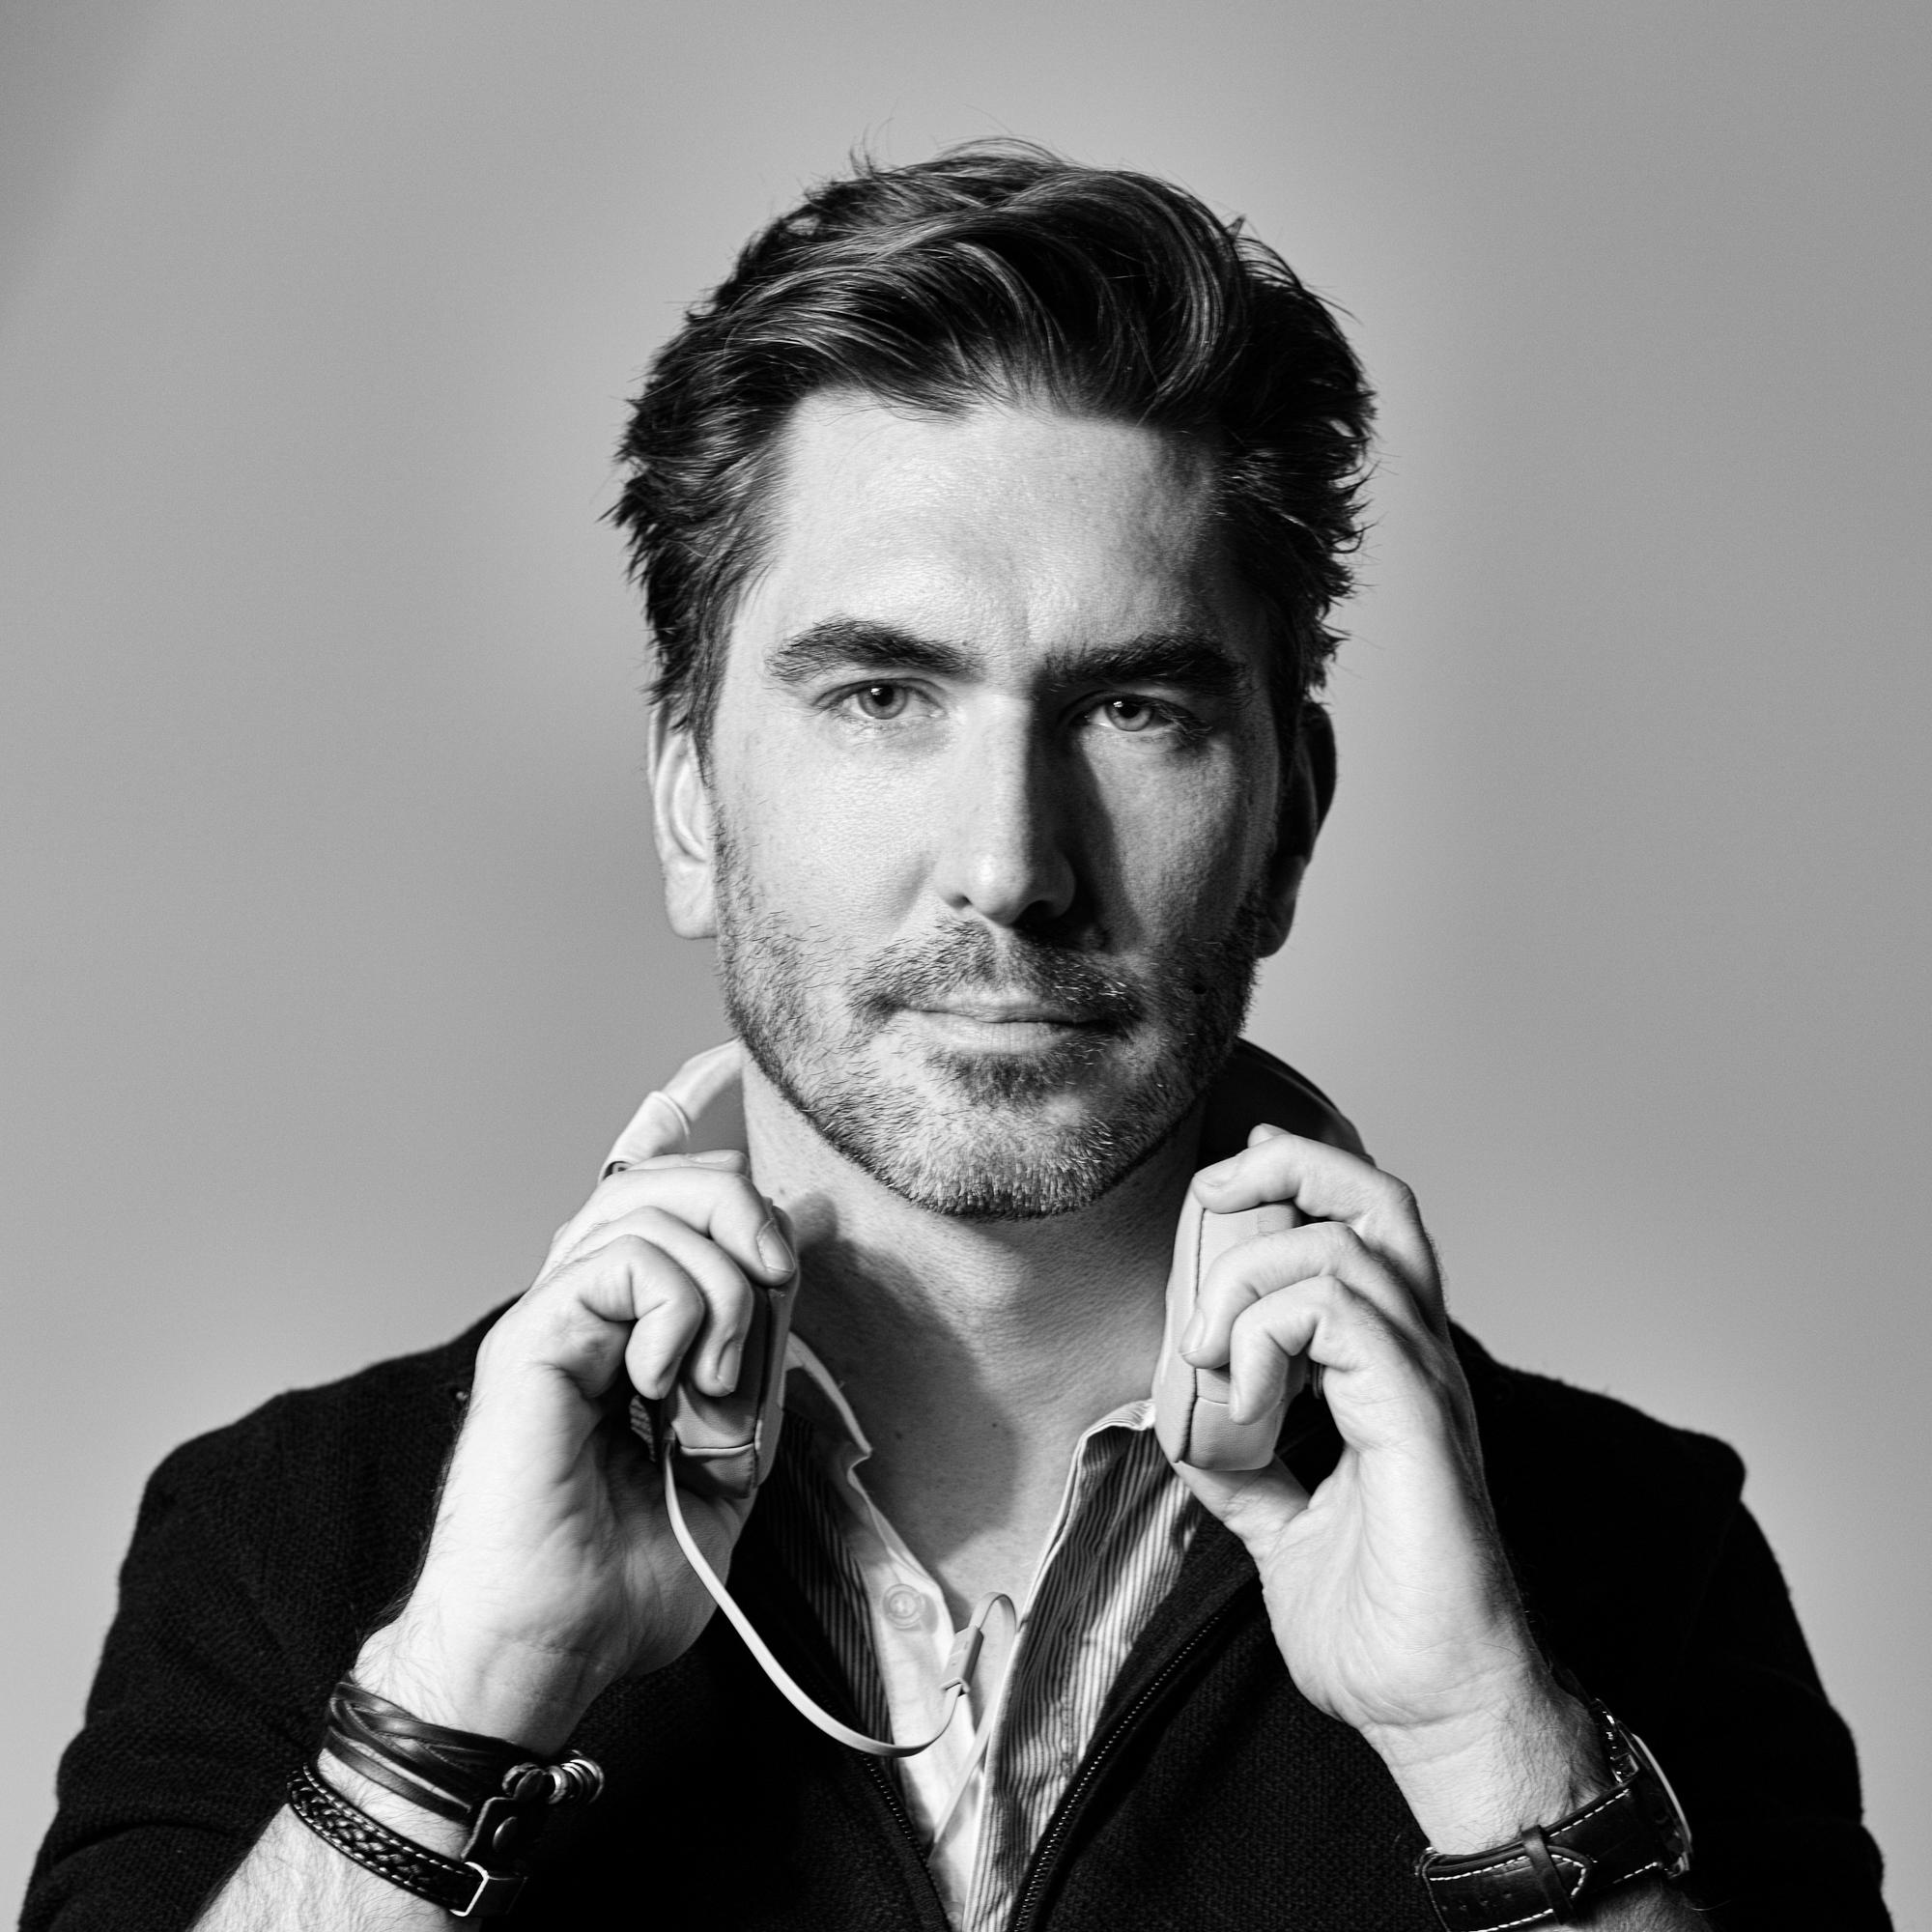 Yannick Burky